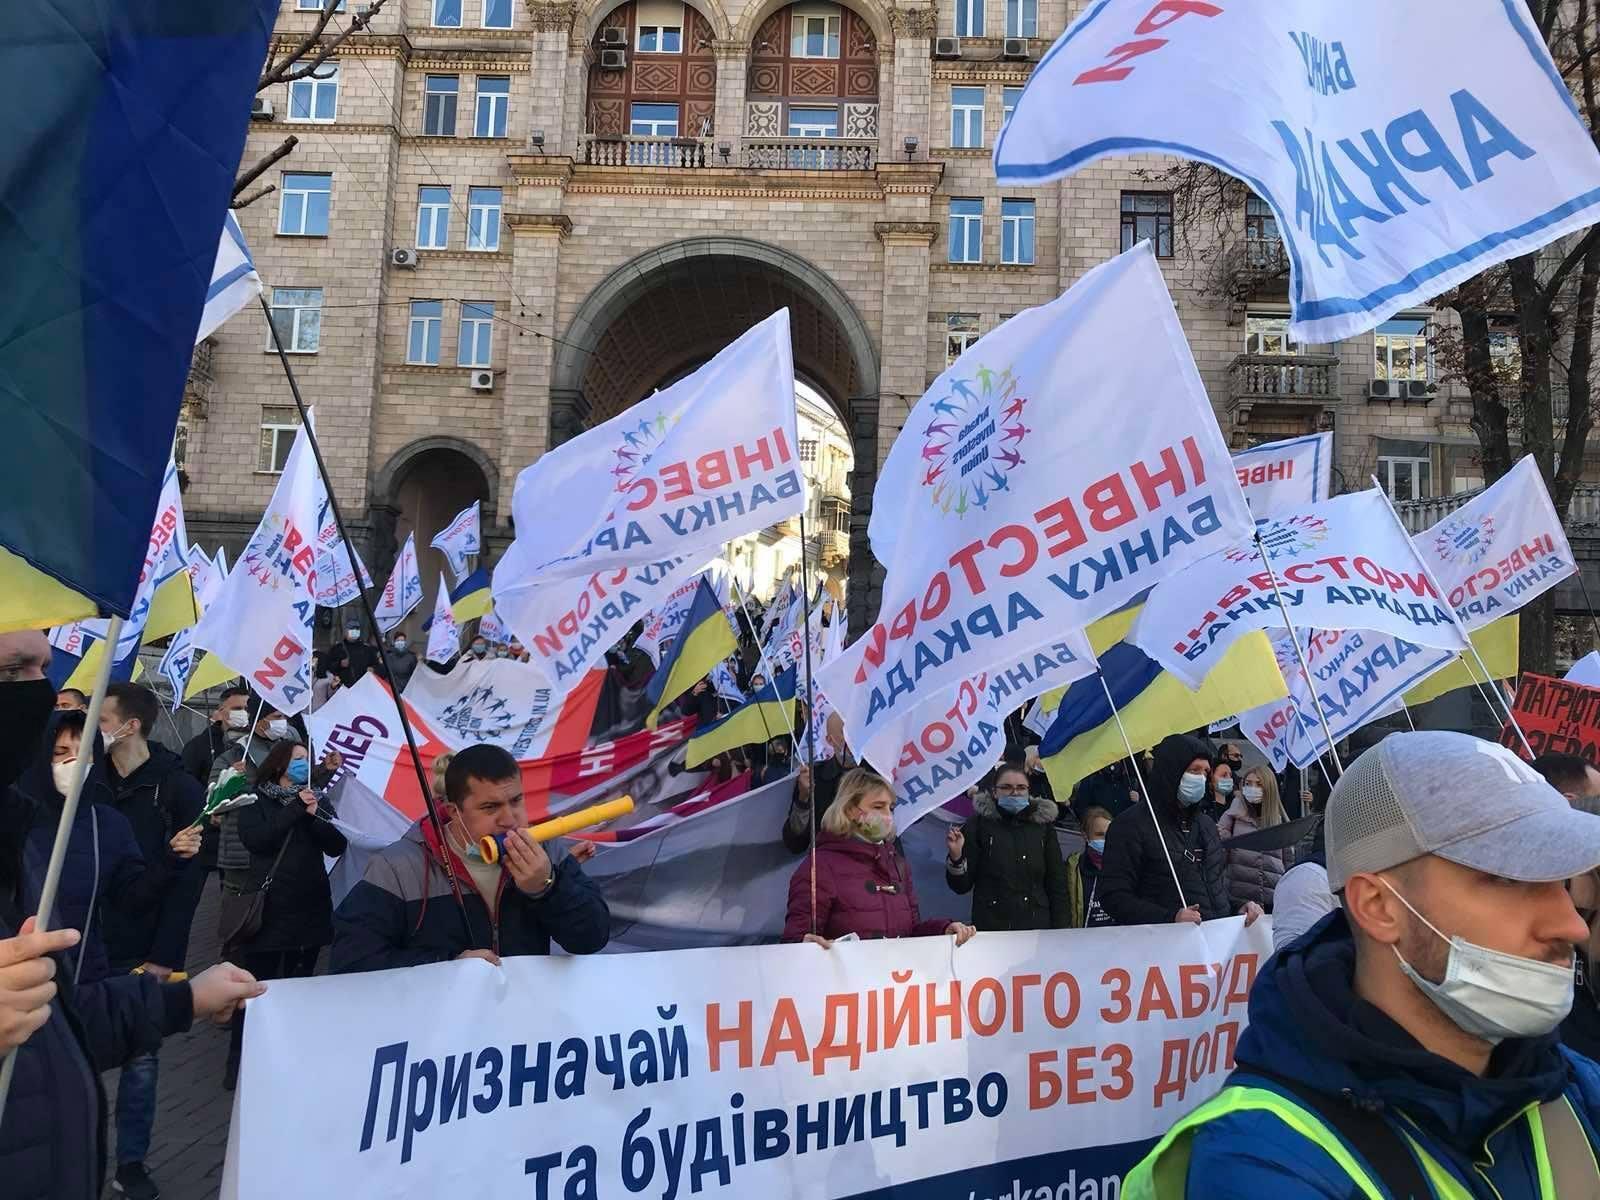 Протестующие перекрыли Крещатик